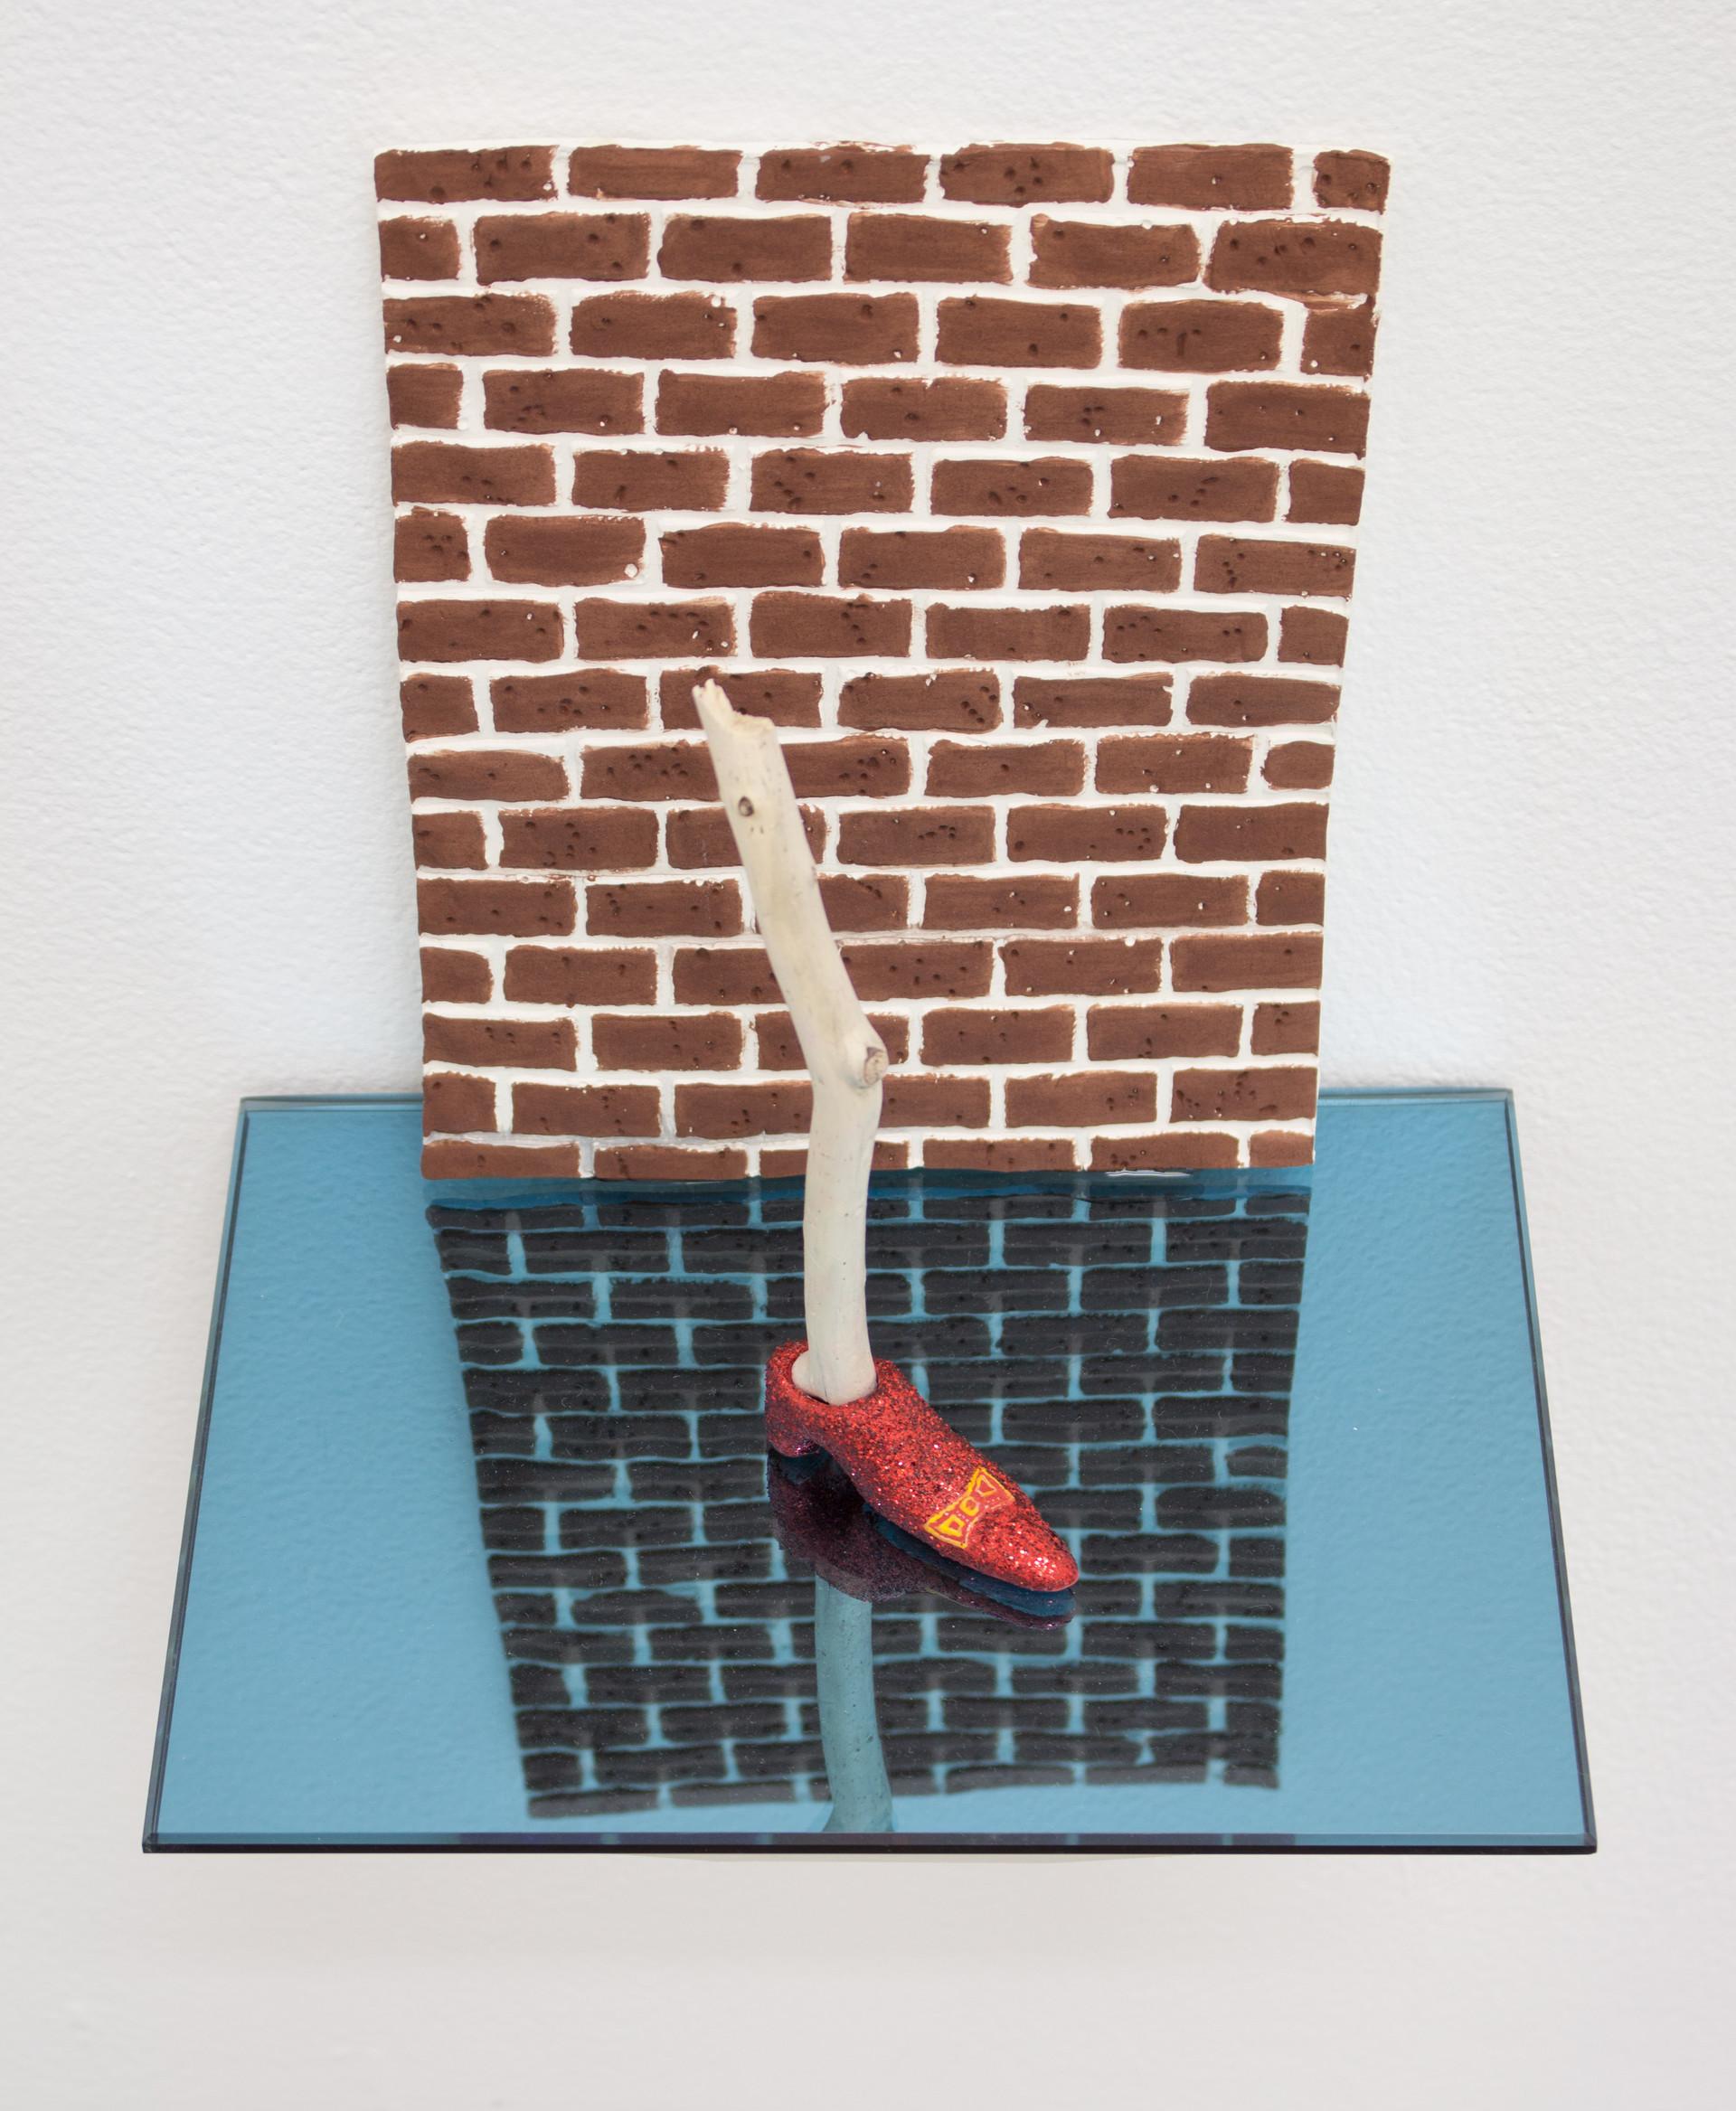 Shoe, Leg, Brick Wall